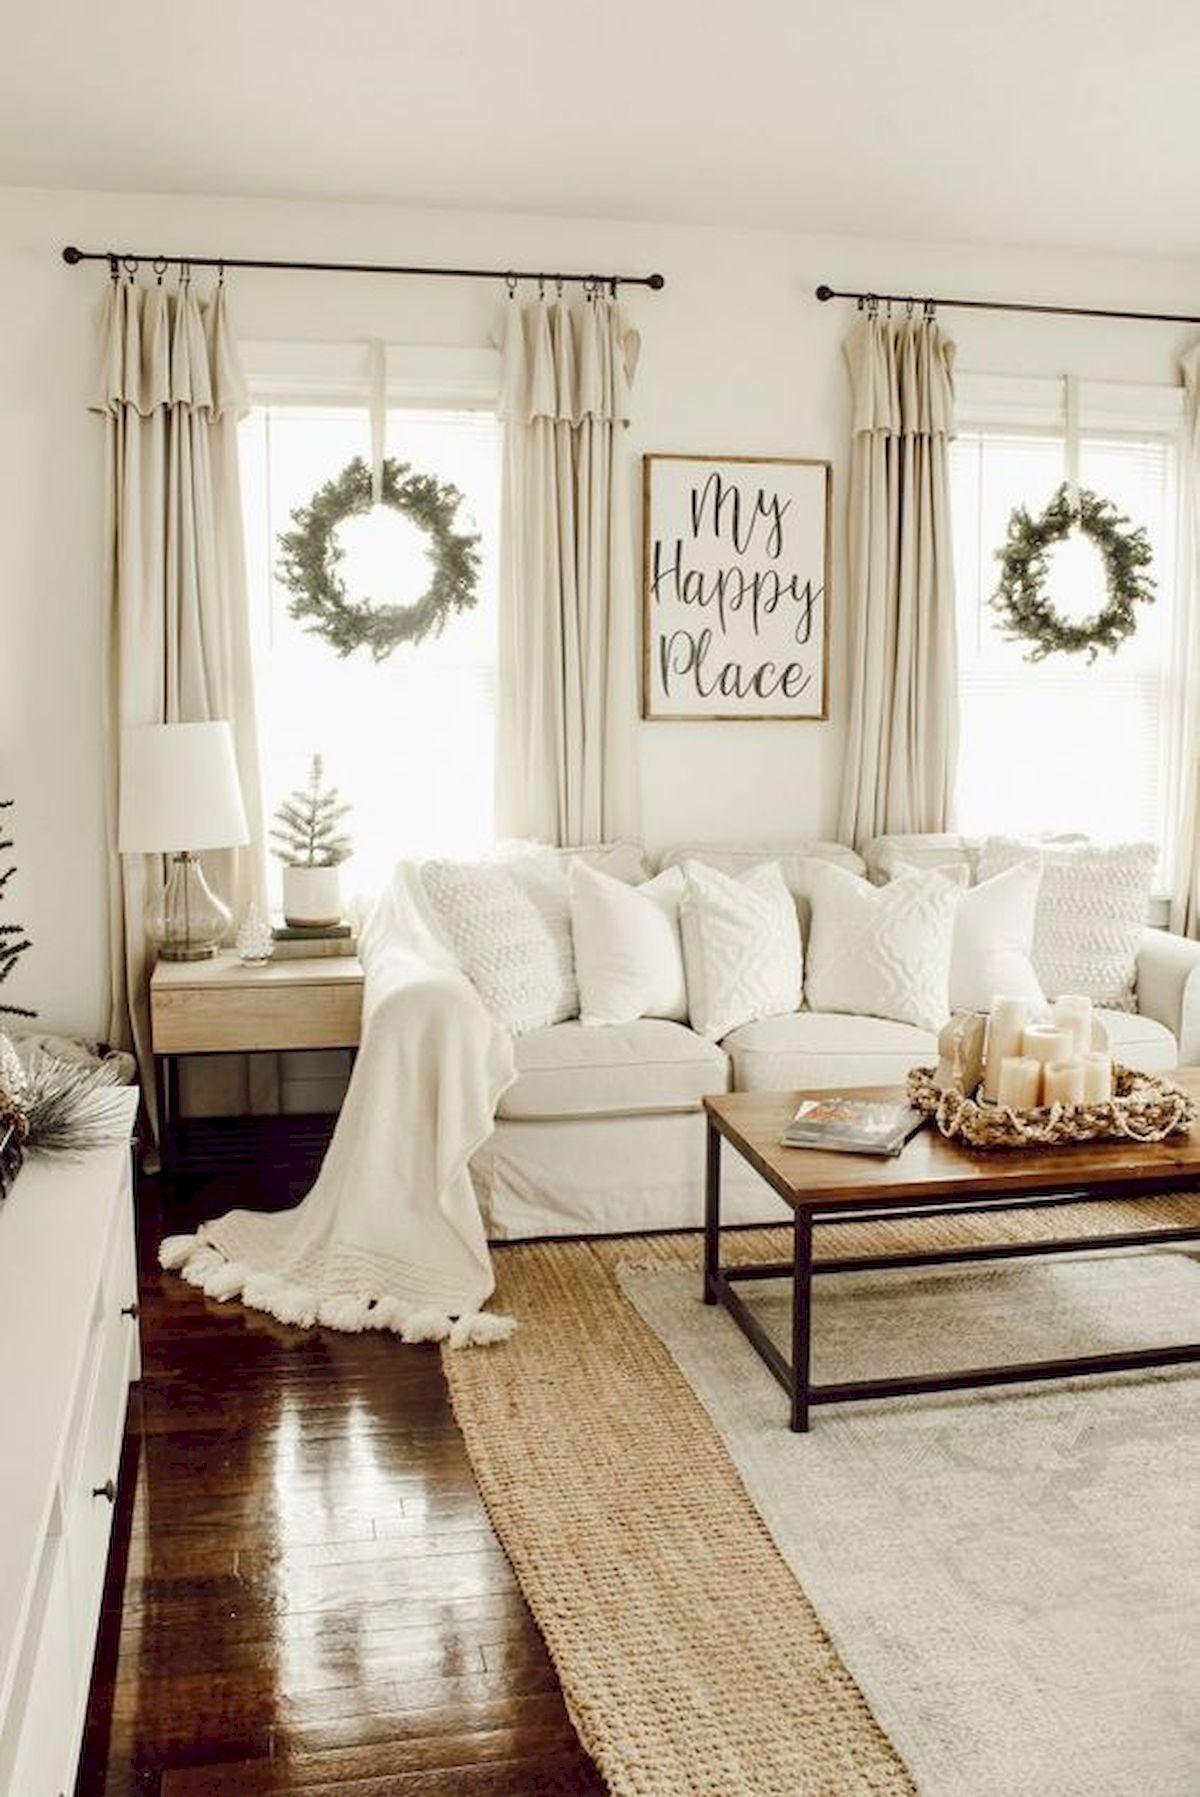 33 Stunning Farmhouse Living Room Curtains Design Ideas An